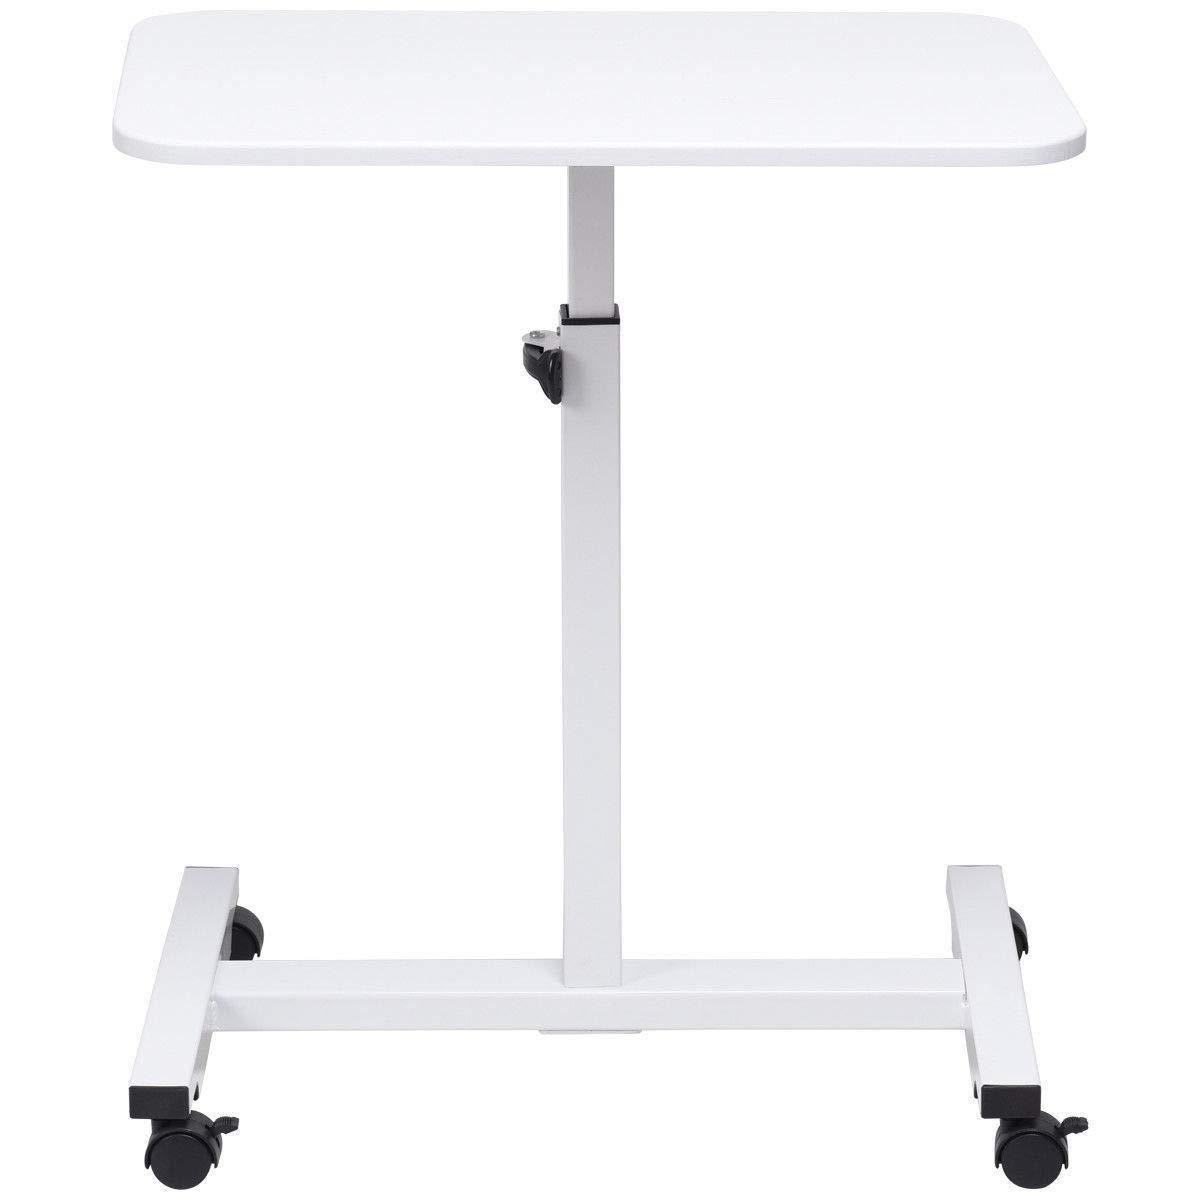 Nual_shop 高さ調整可能 ノートパソコンデスクワークステーションカート ベッドサイドテーブル   B07PWVH62C